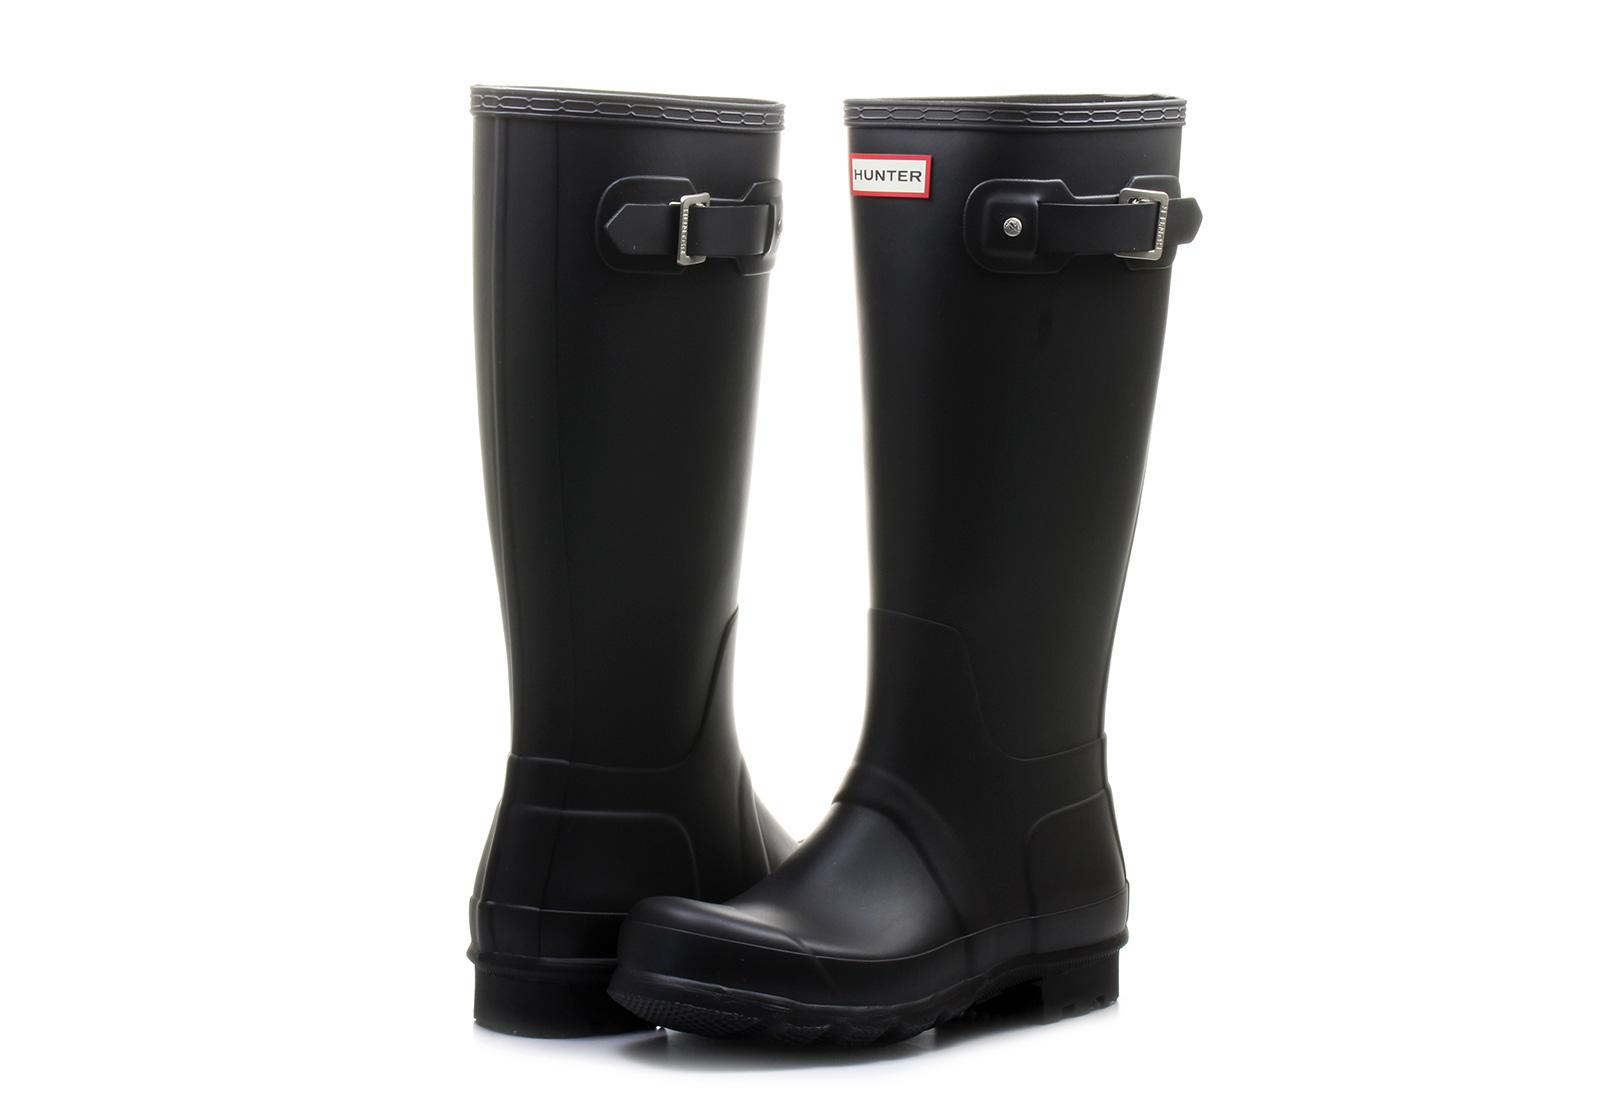 Hunter Boots - Mens Original Tall - t9000rma-blk - Online ...